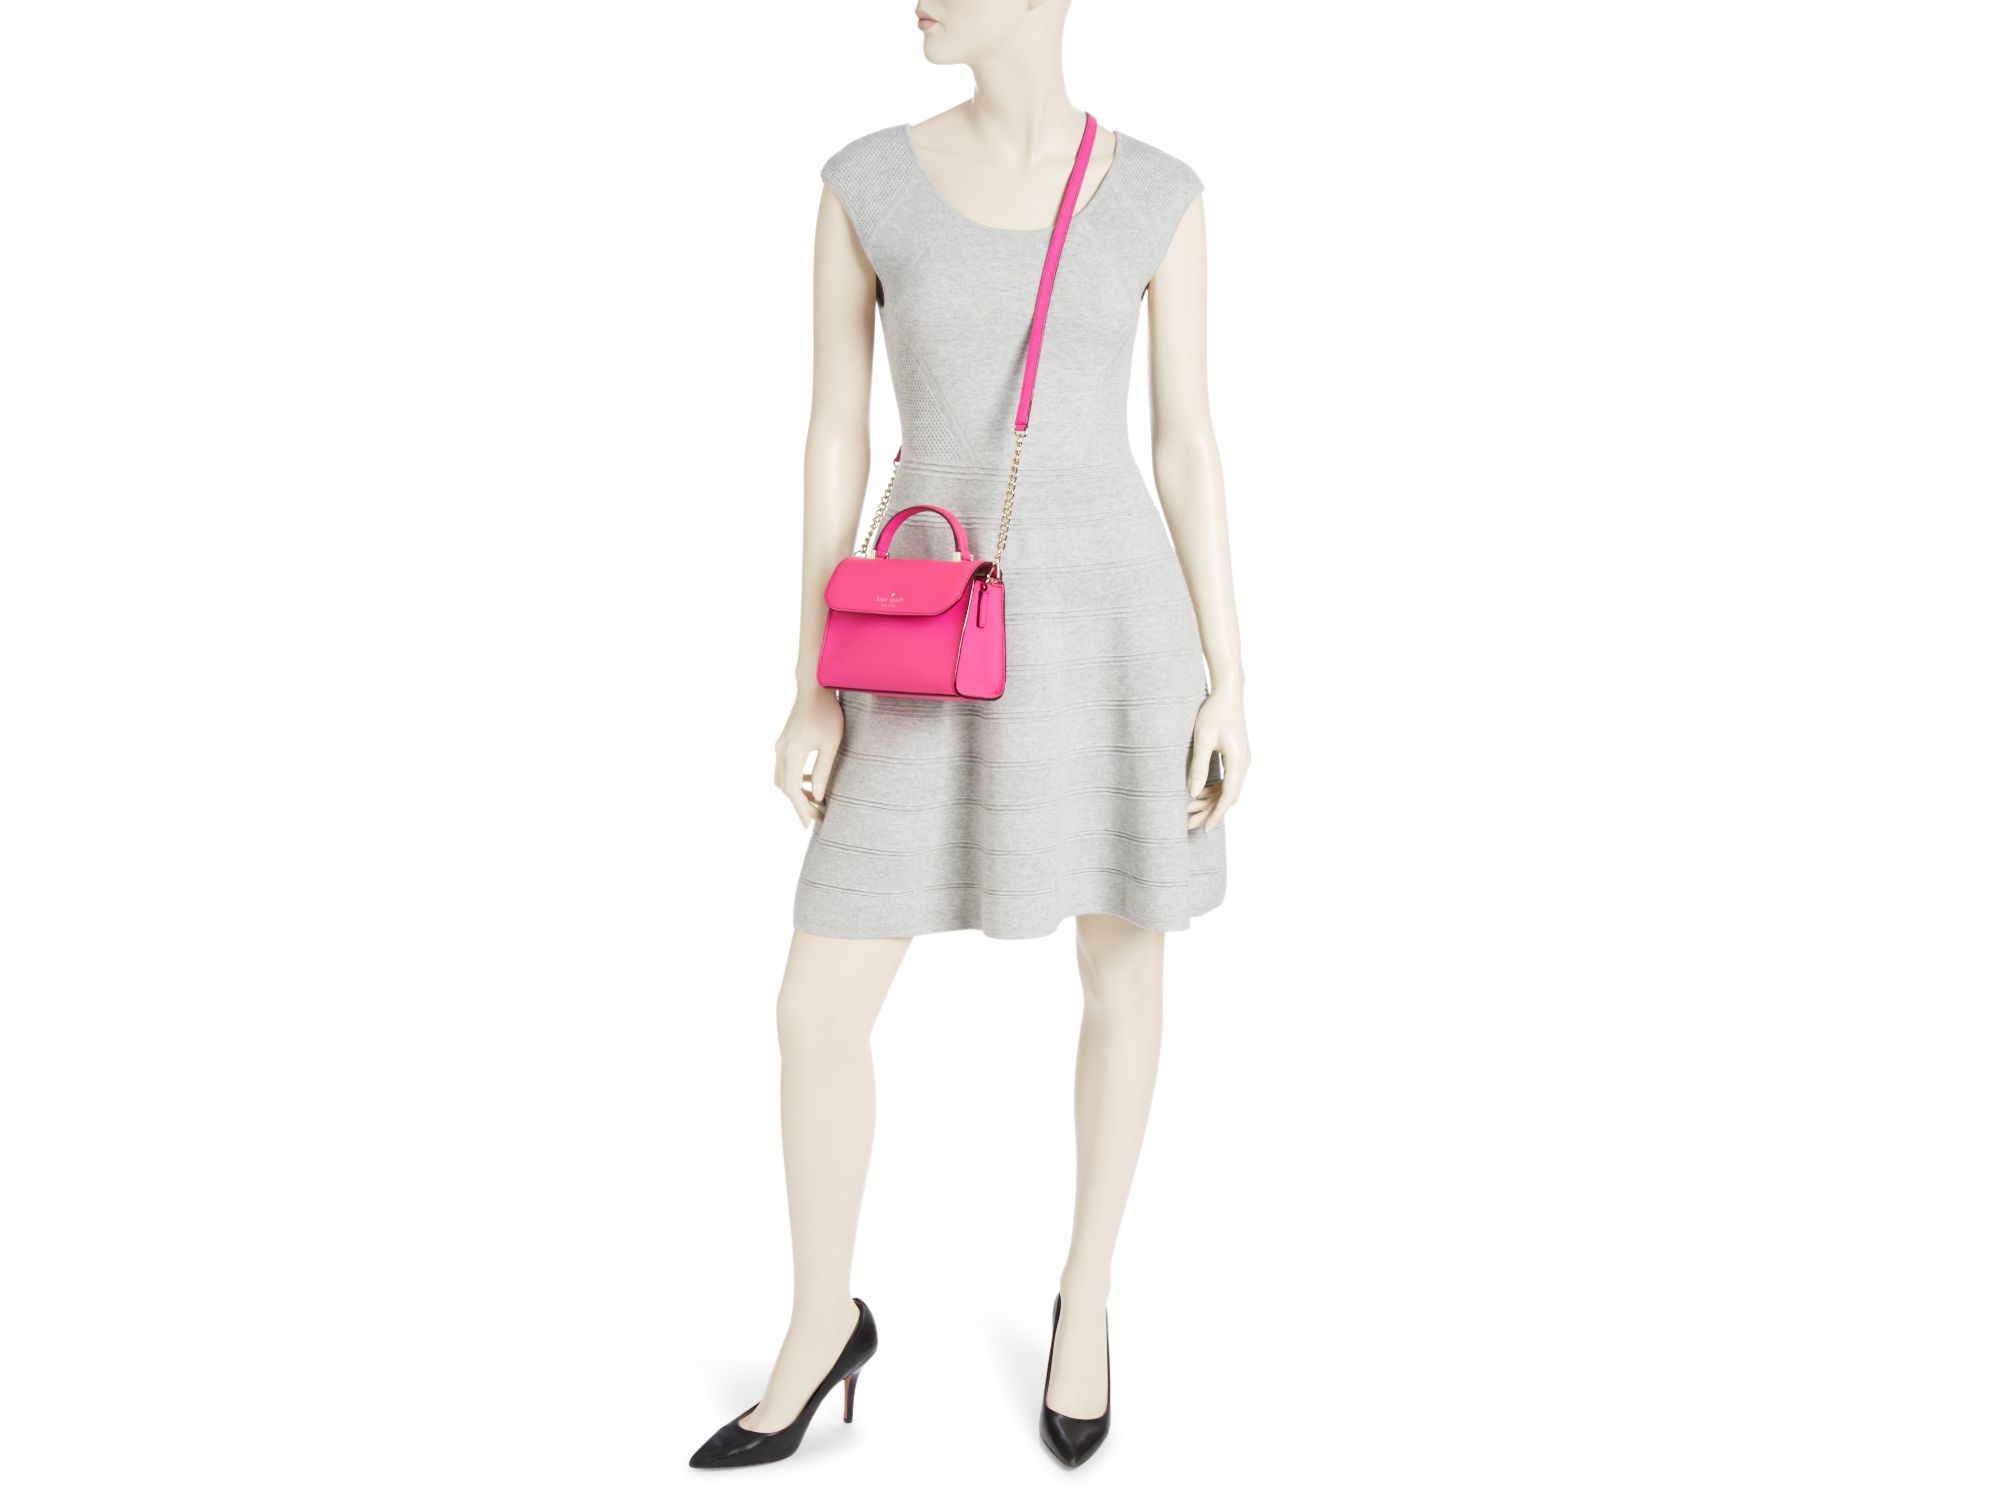 77cbc137e9f0 Lyst - Kate Spade New York Cedar Street Mini Nora Crossbody in Pink